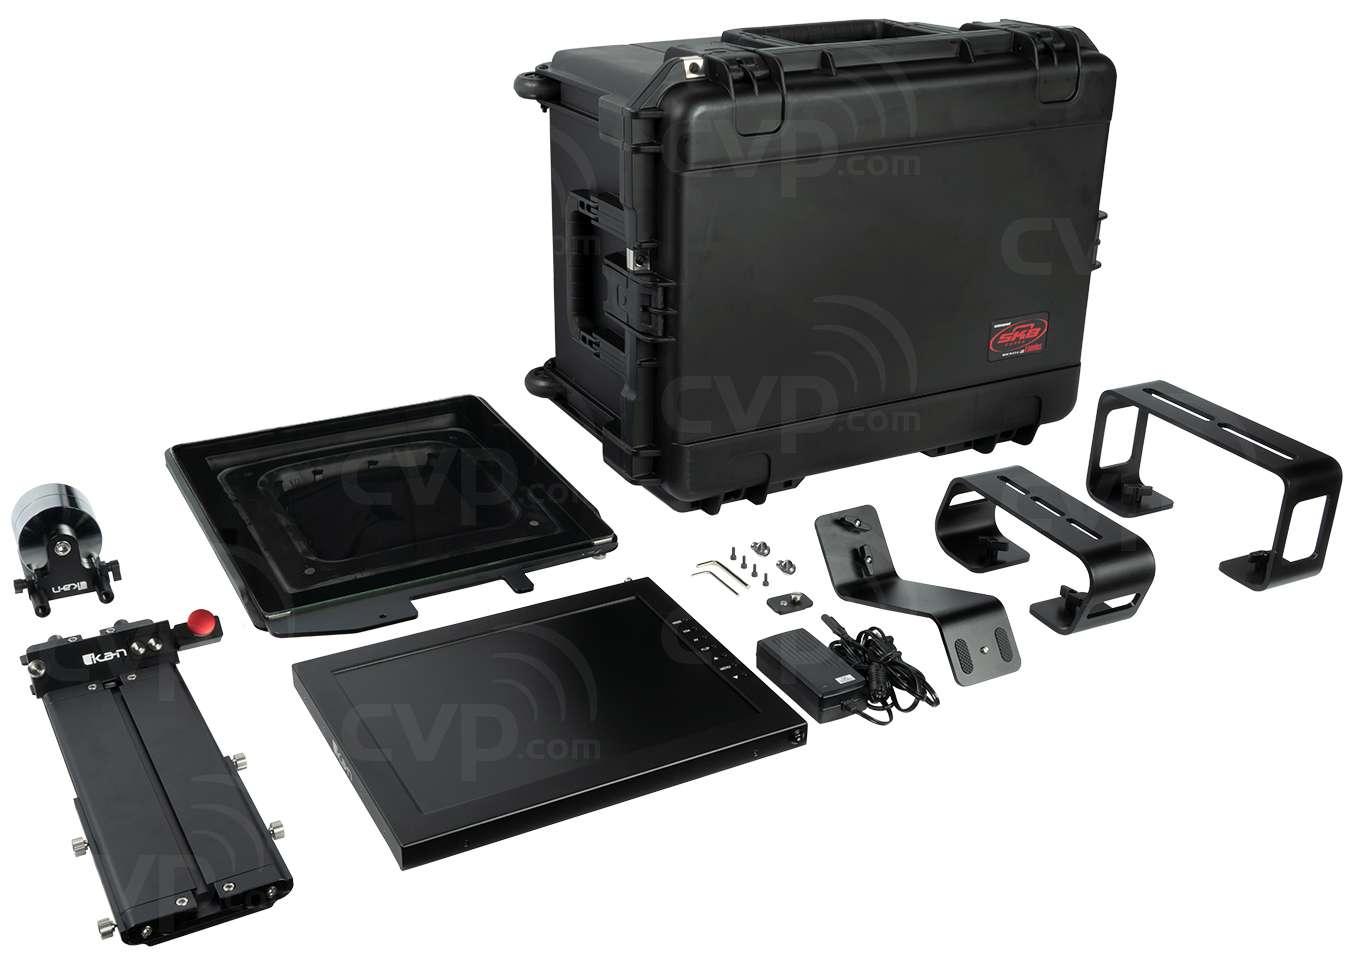 Ikan PT4700 Travel Kit